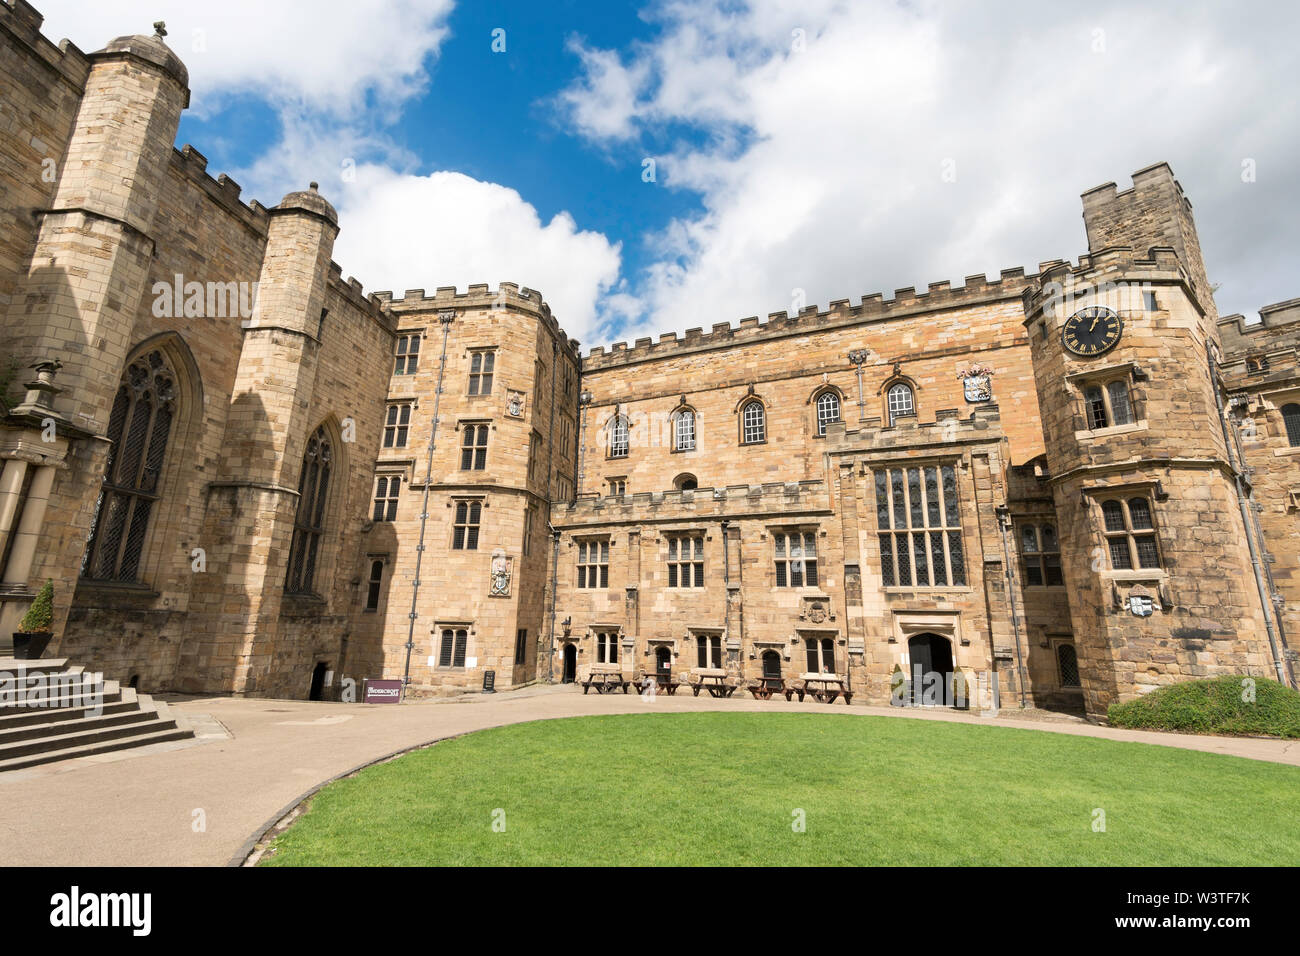 The courtyard of Durham Castle, part of University College Durham, England, UK - Stock Image